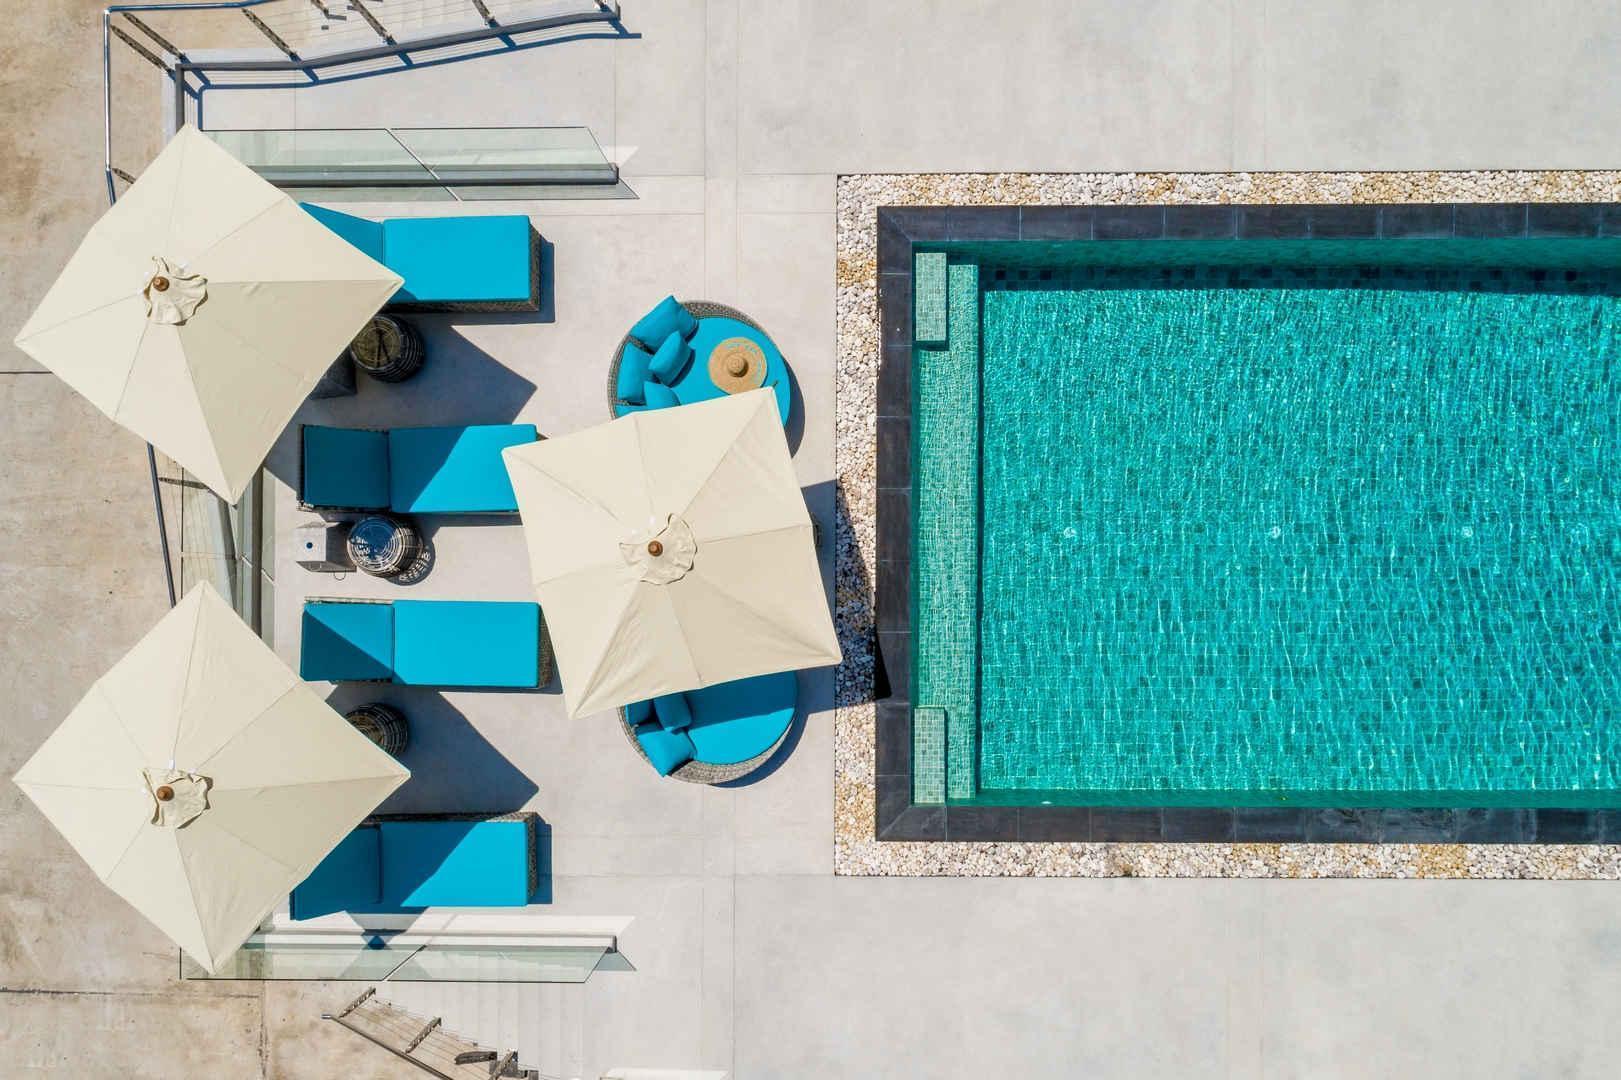 2BR Luxury Town House MUSE 400m to the beach บ้านเดี่ยว 2 ห้องนอน 1 ห้องน้ำส่วนตัว ขนาด 132 ตร.ม. – เชิงมน